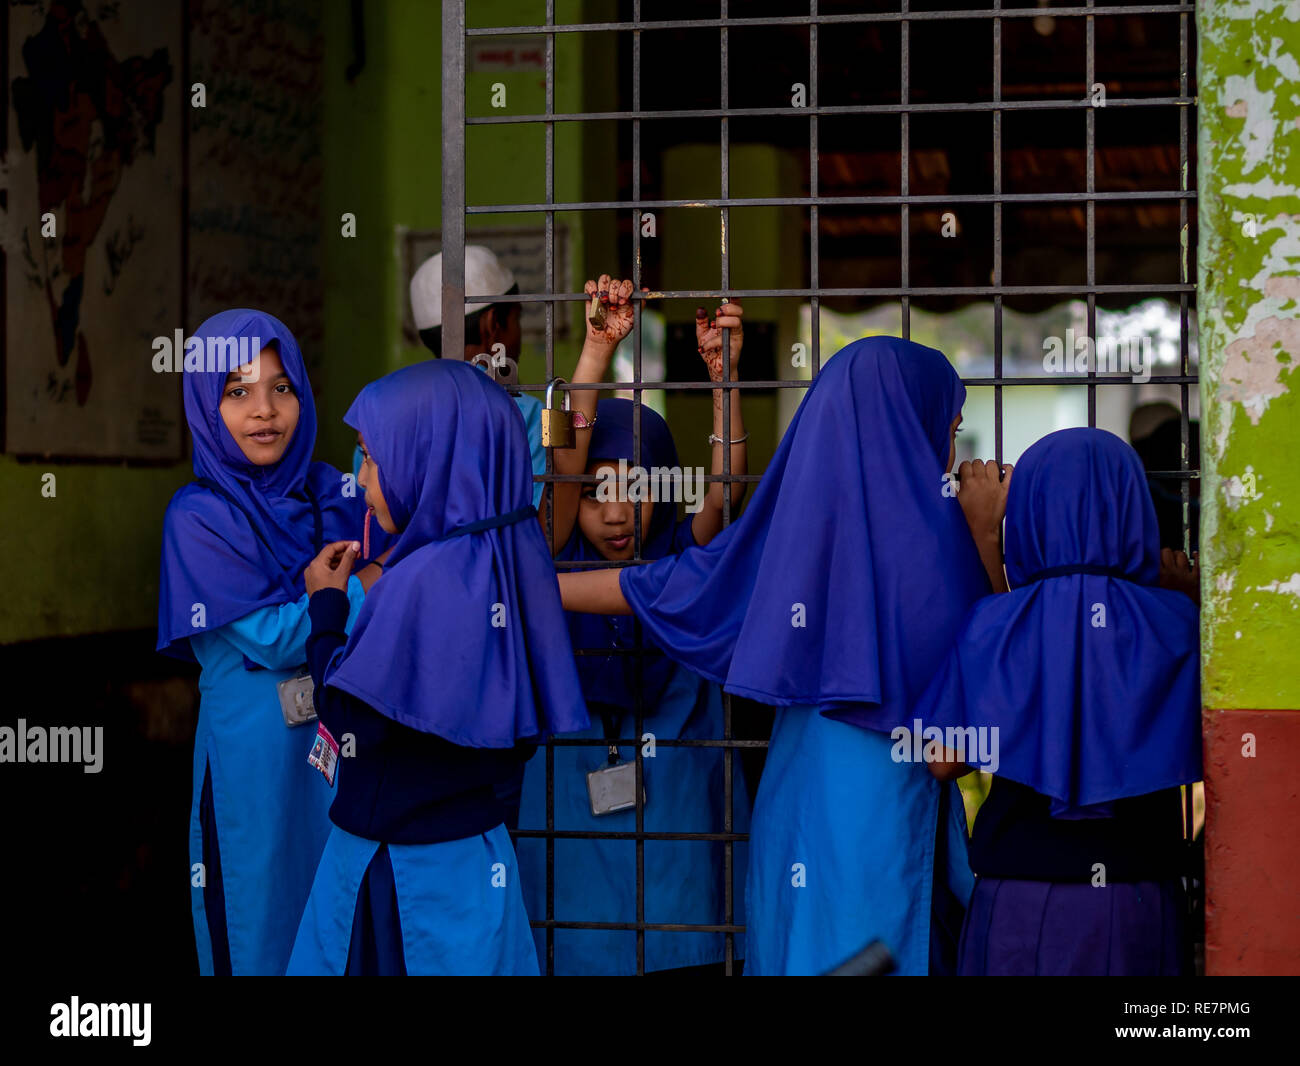 Muslim School Uniform Stock Photos & Muslim School Uniform